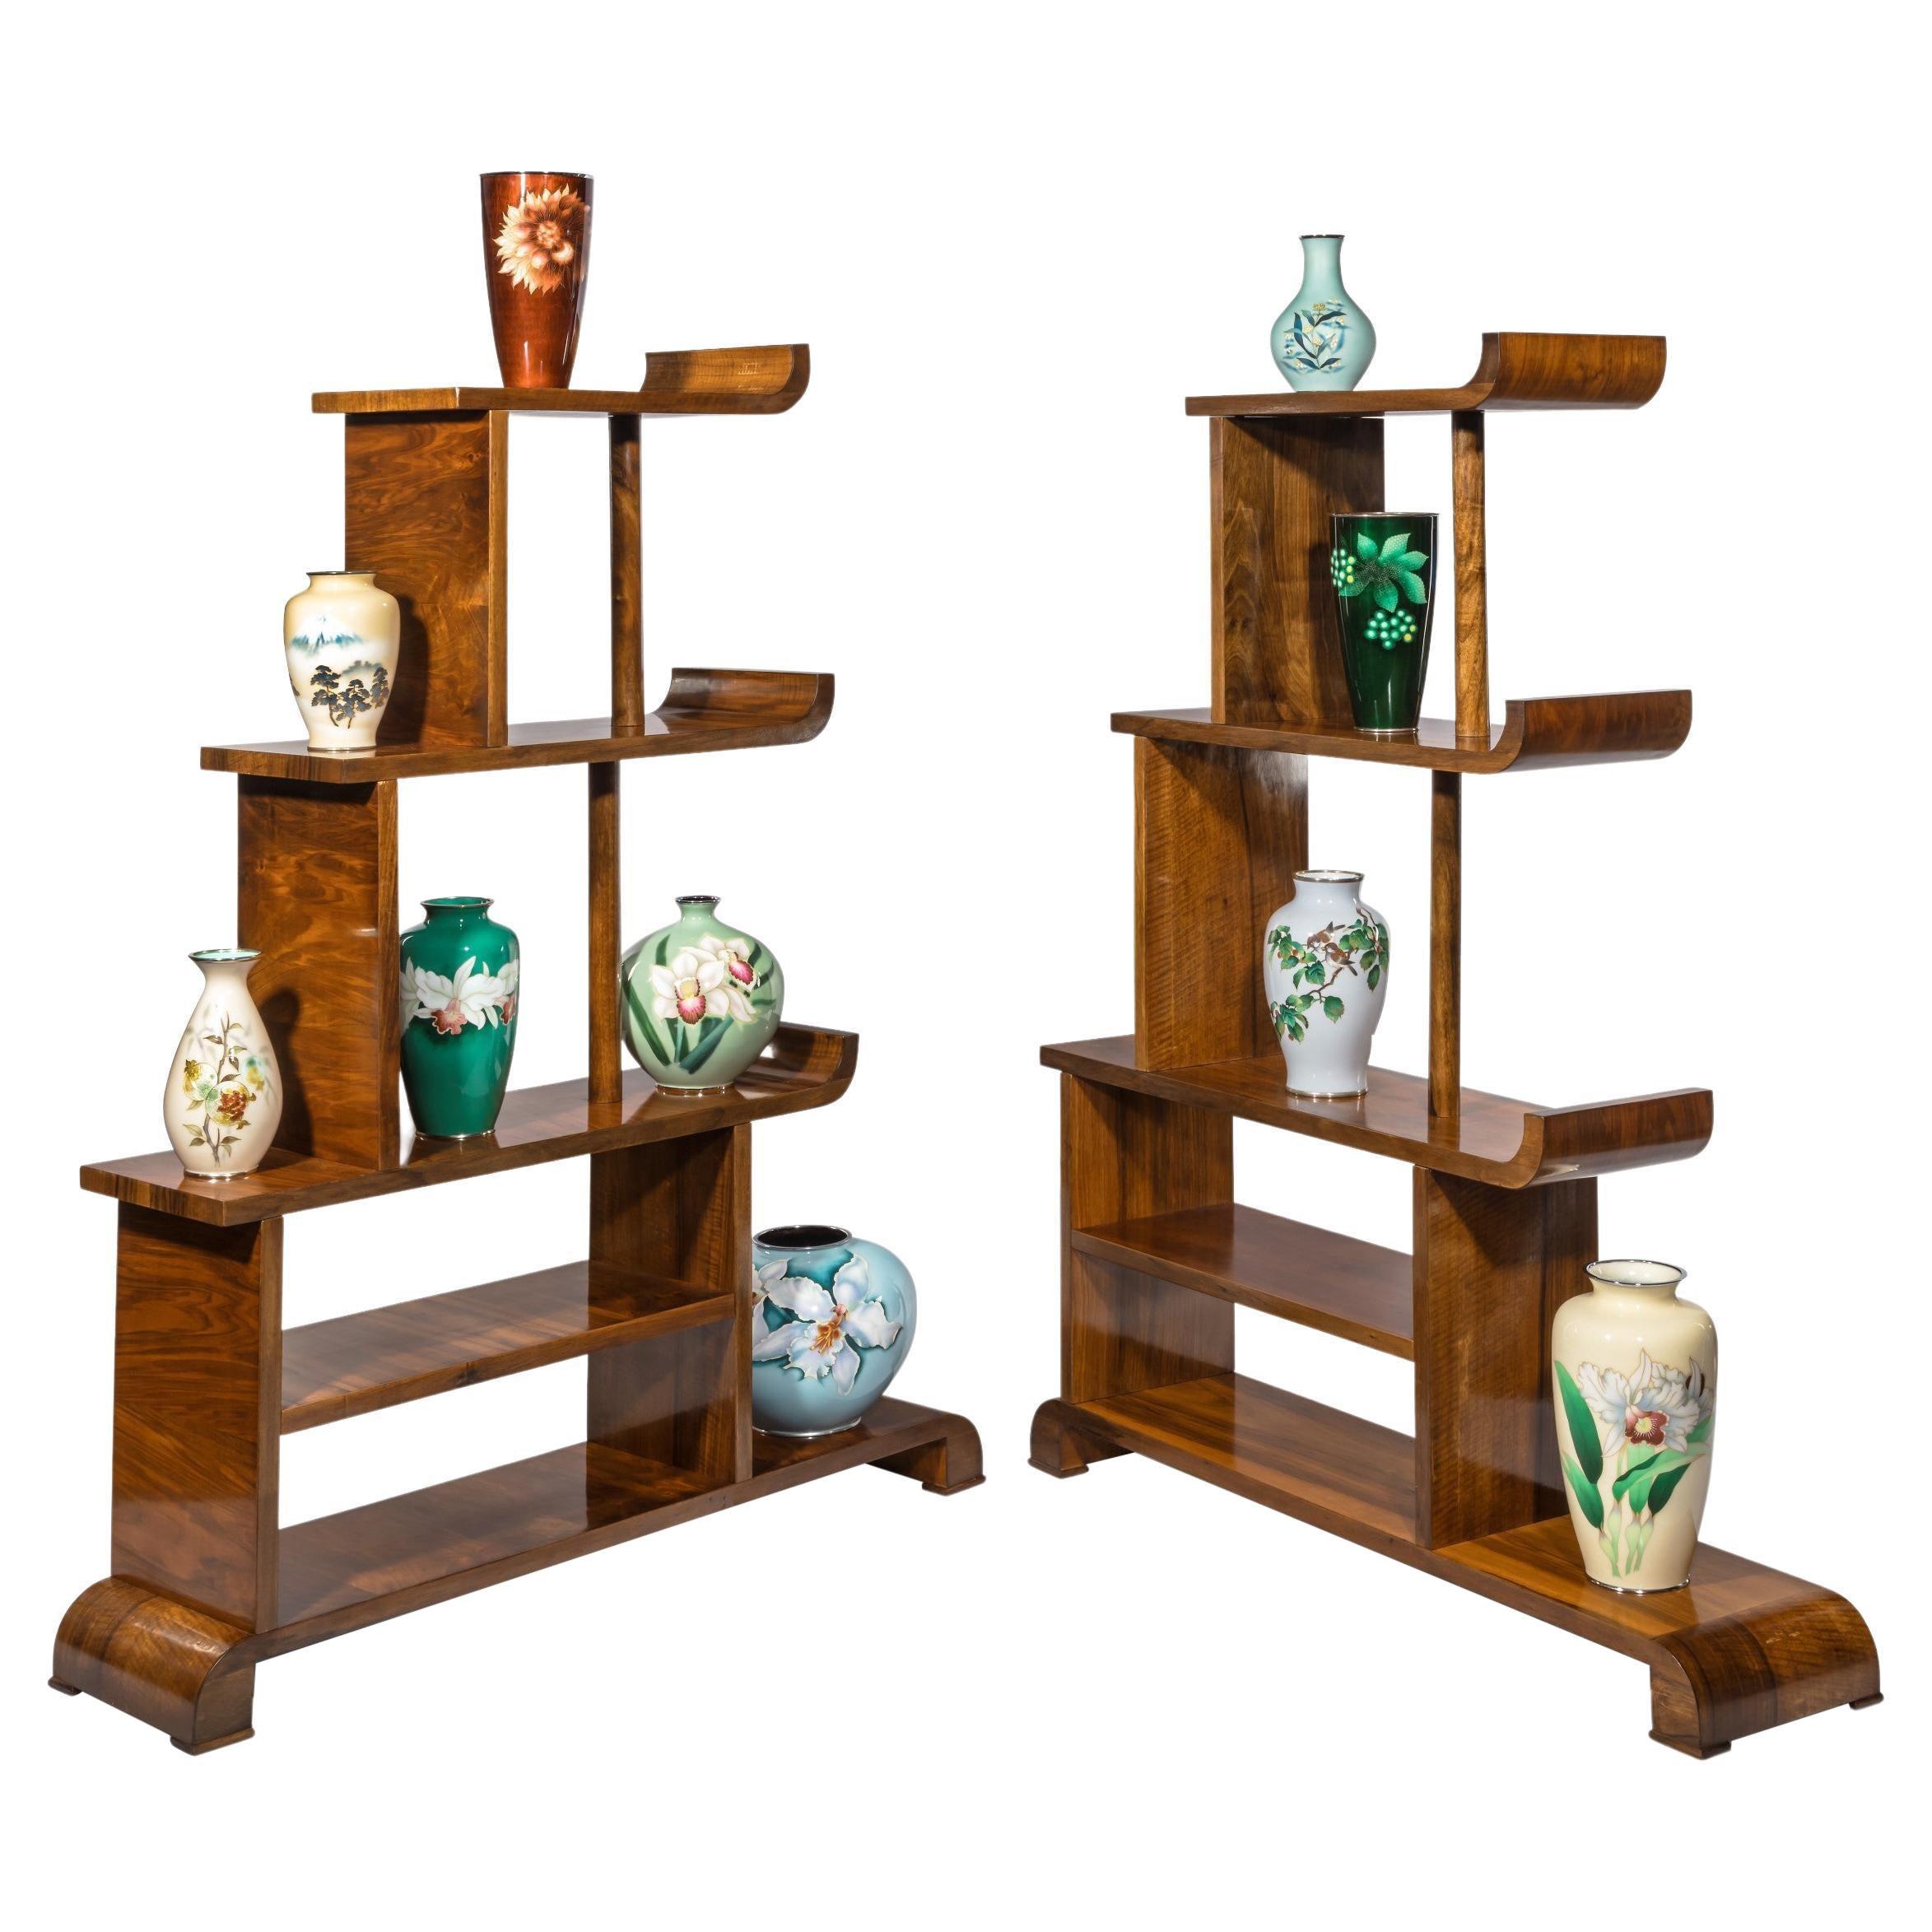 Pair of Asymmetrical Art Deco Walnut Shelves